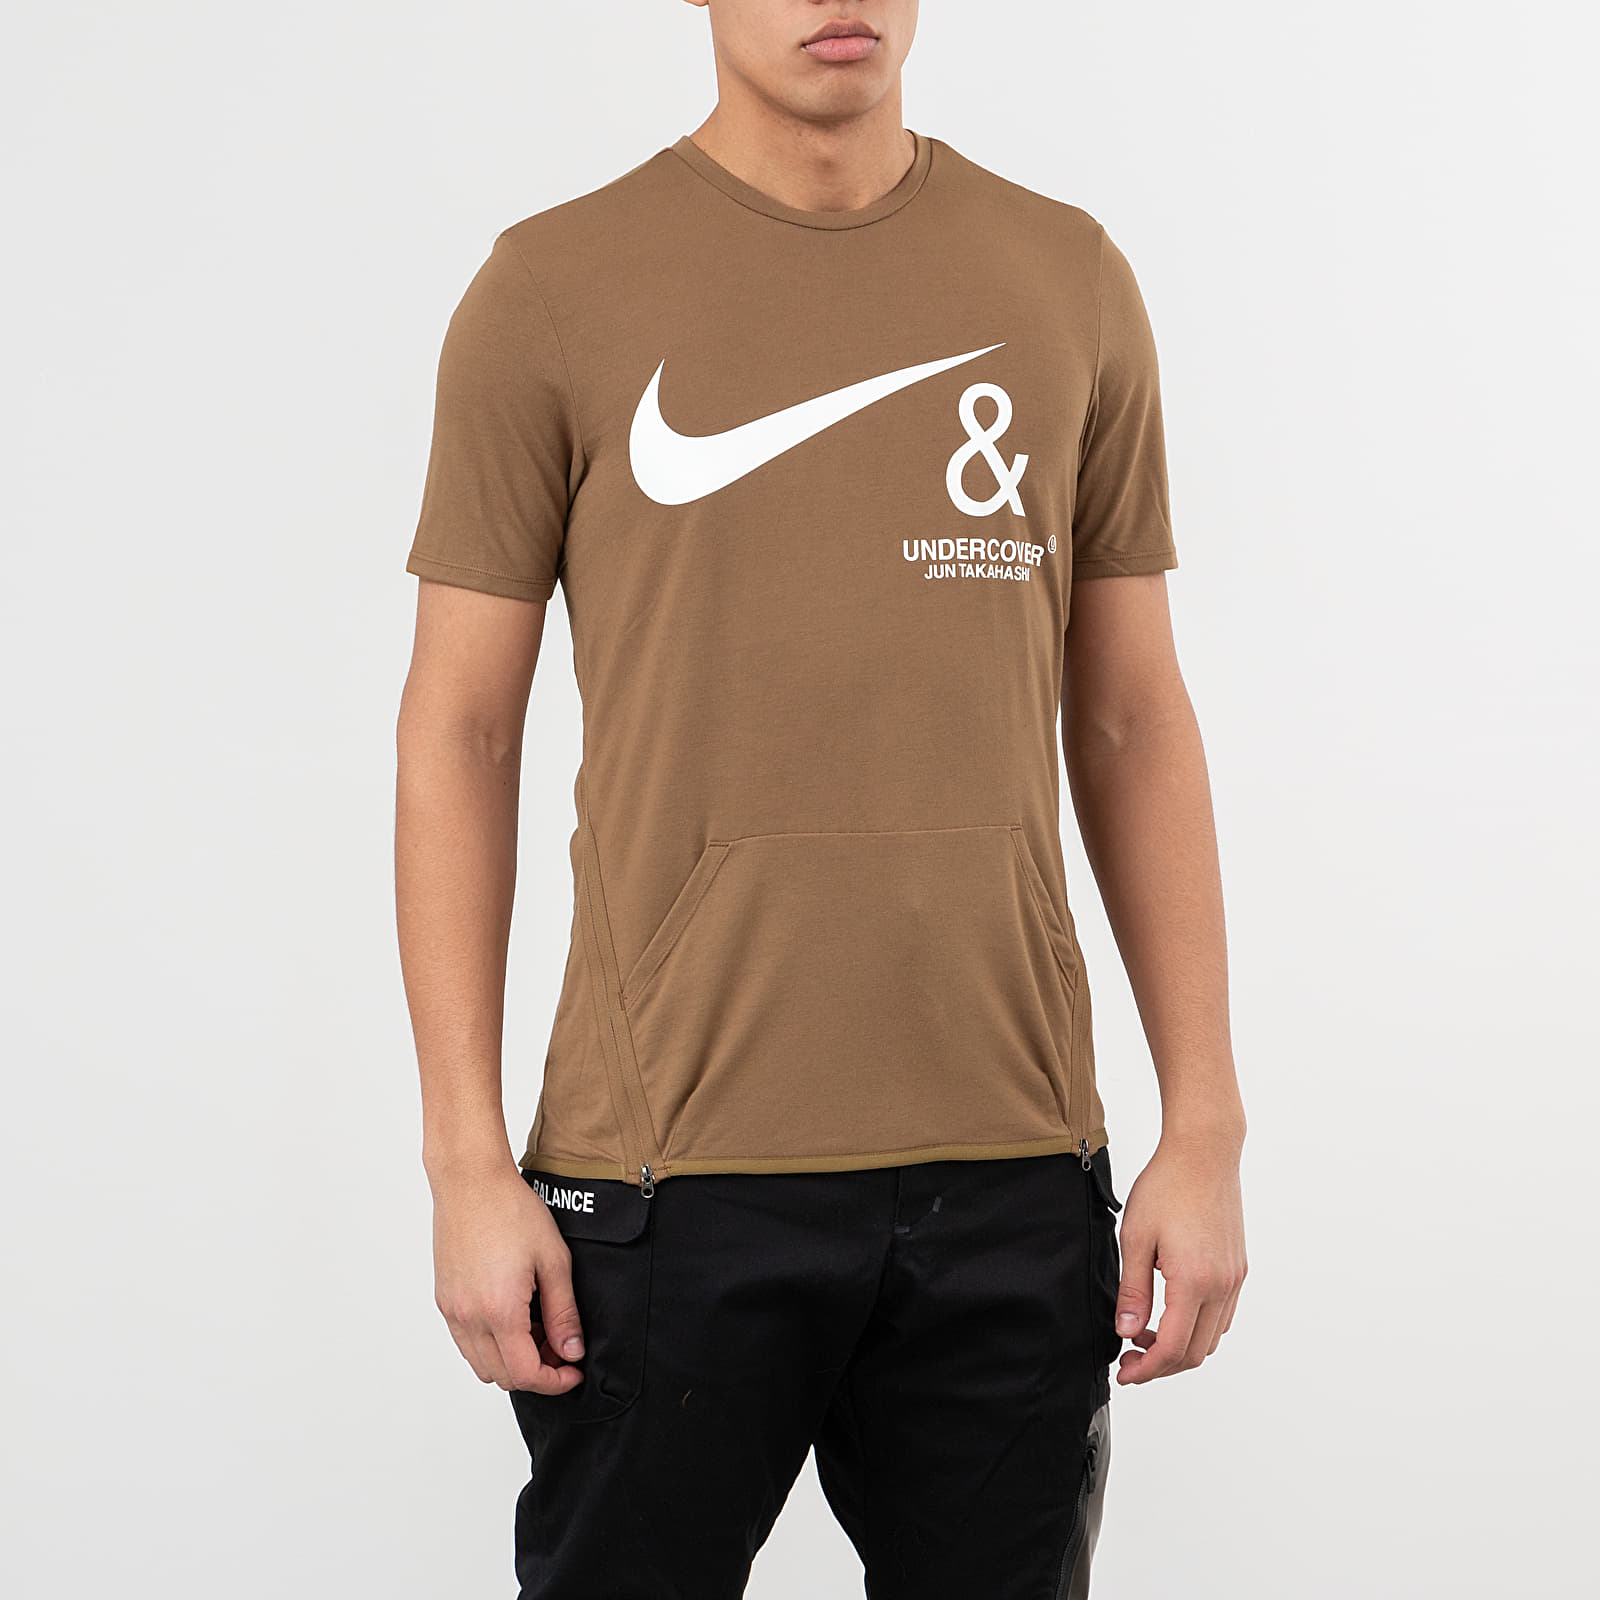 NikeLab x Undercover Tee